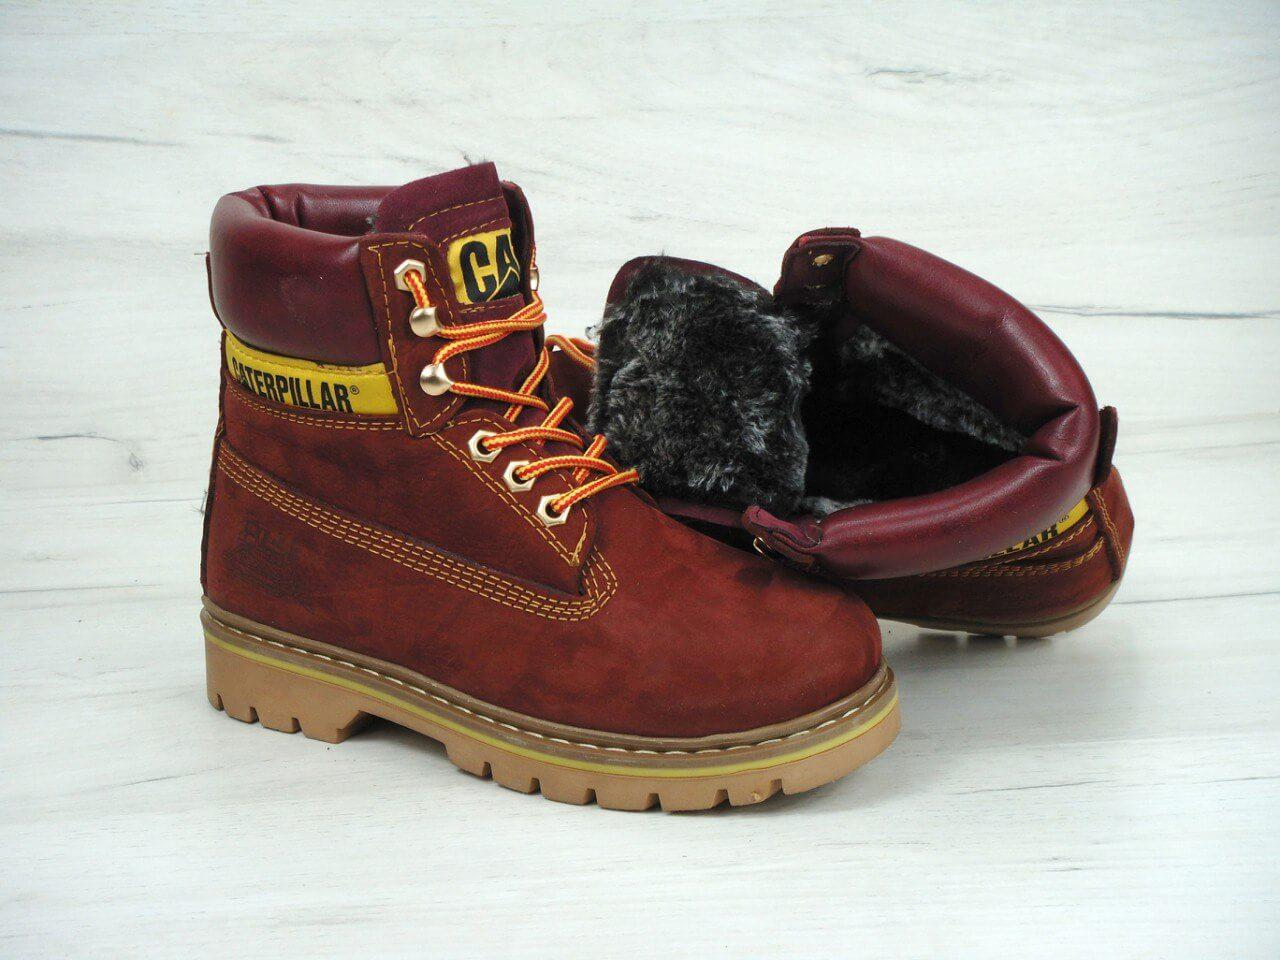 Женские ботинки Caterpillar Winter Boots Classic Bordo, фото 1